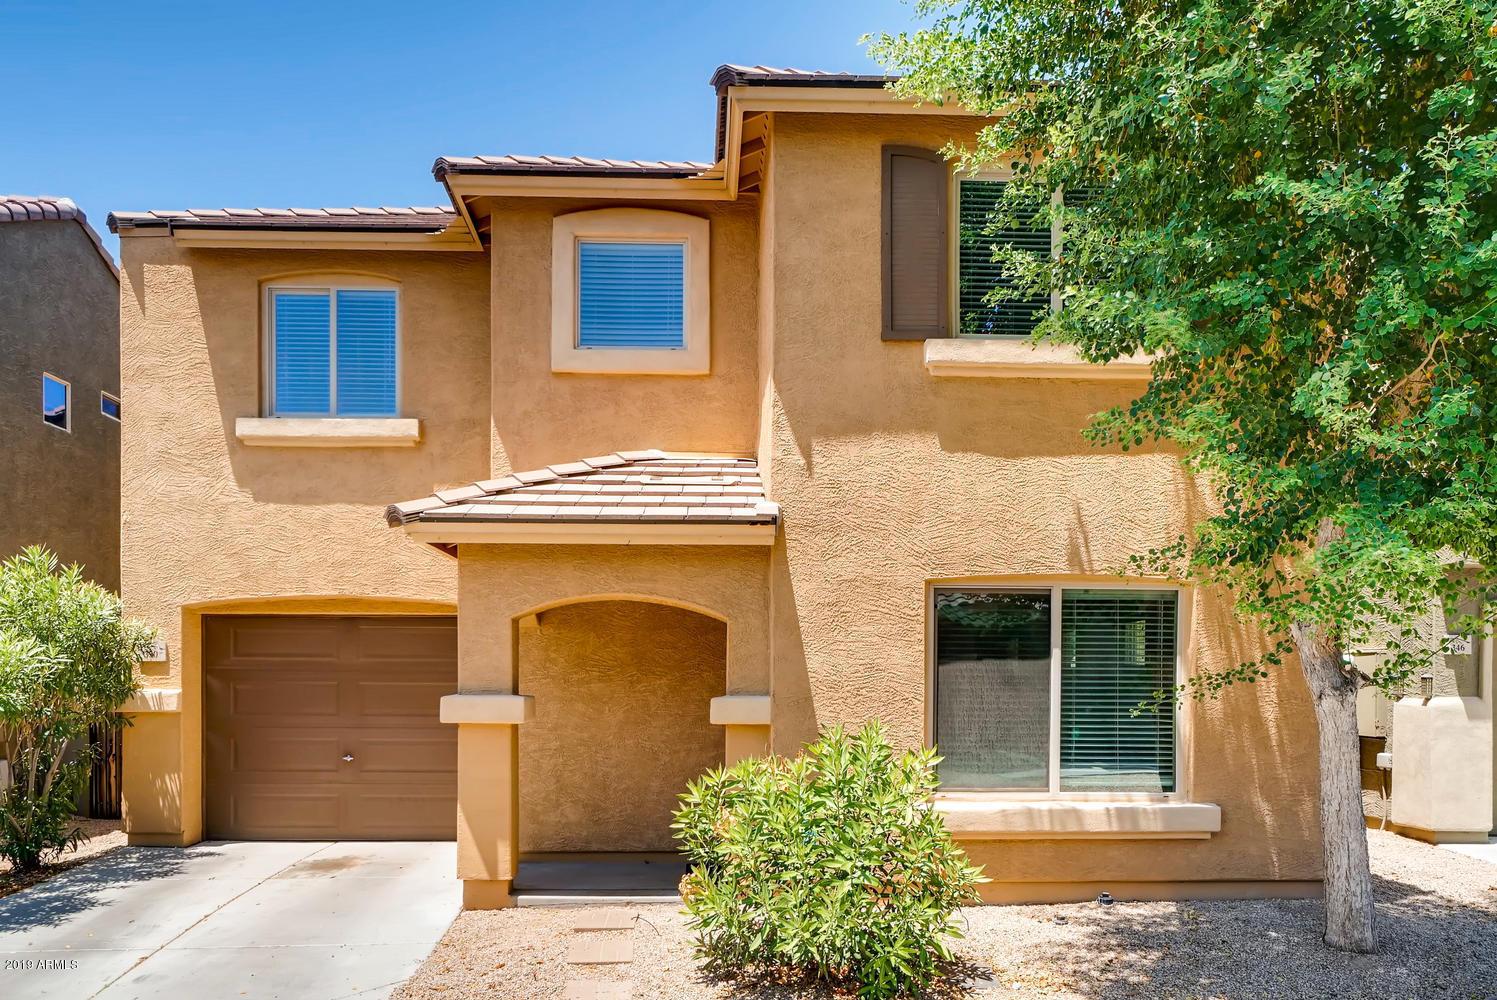 Photo of 350 S AARON --, Mesa, AZ 85208